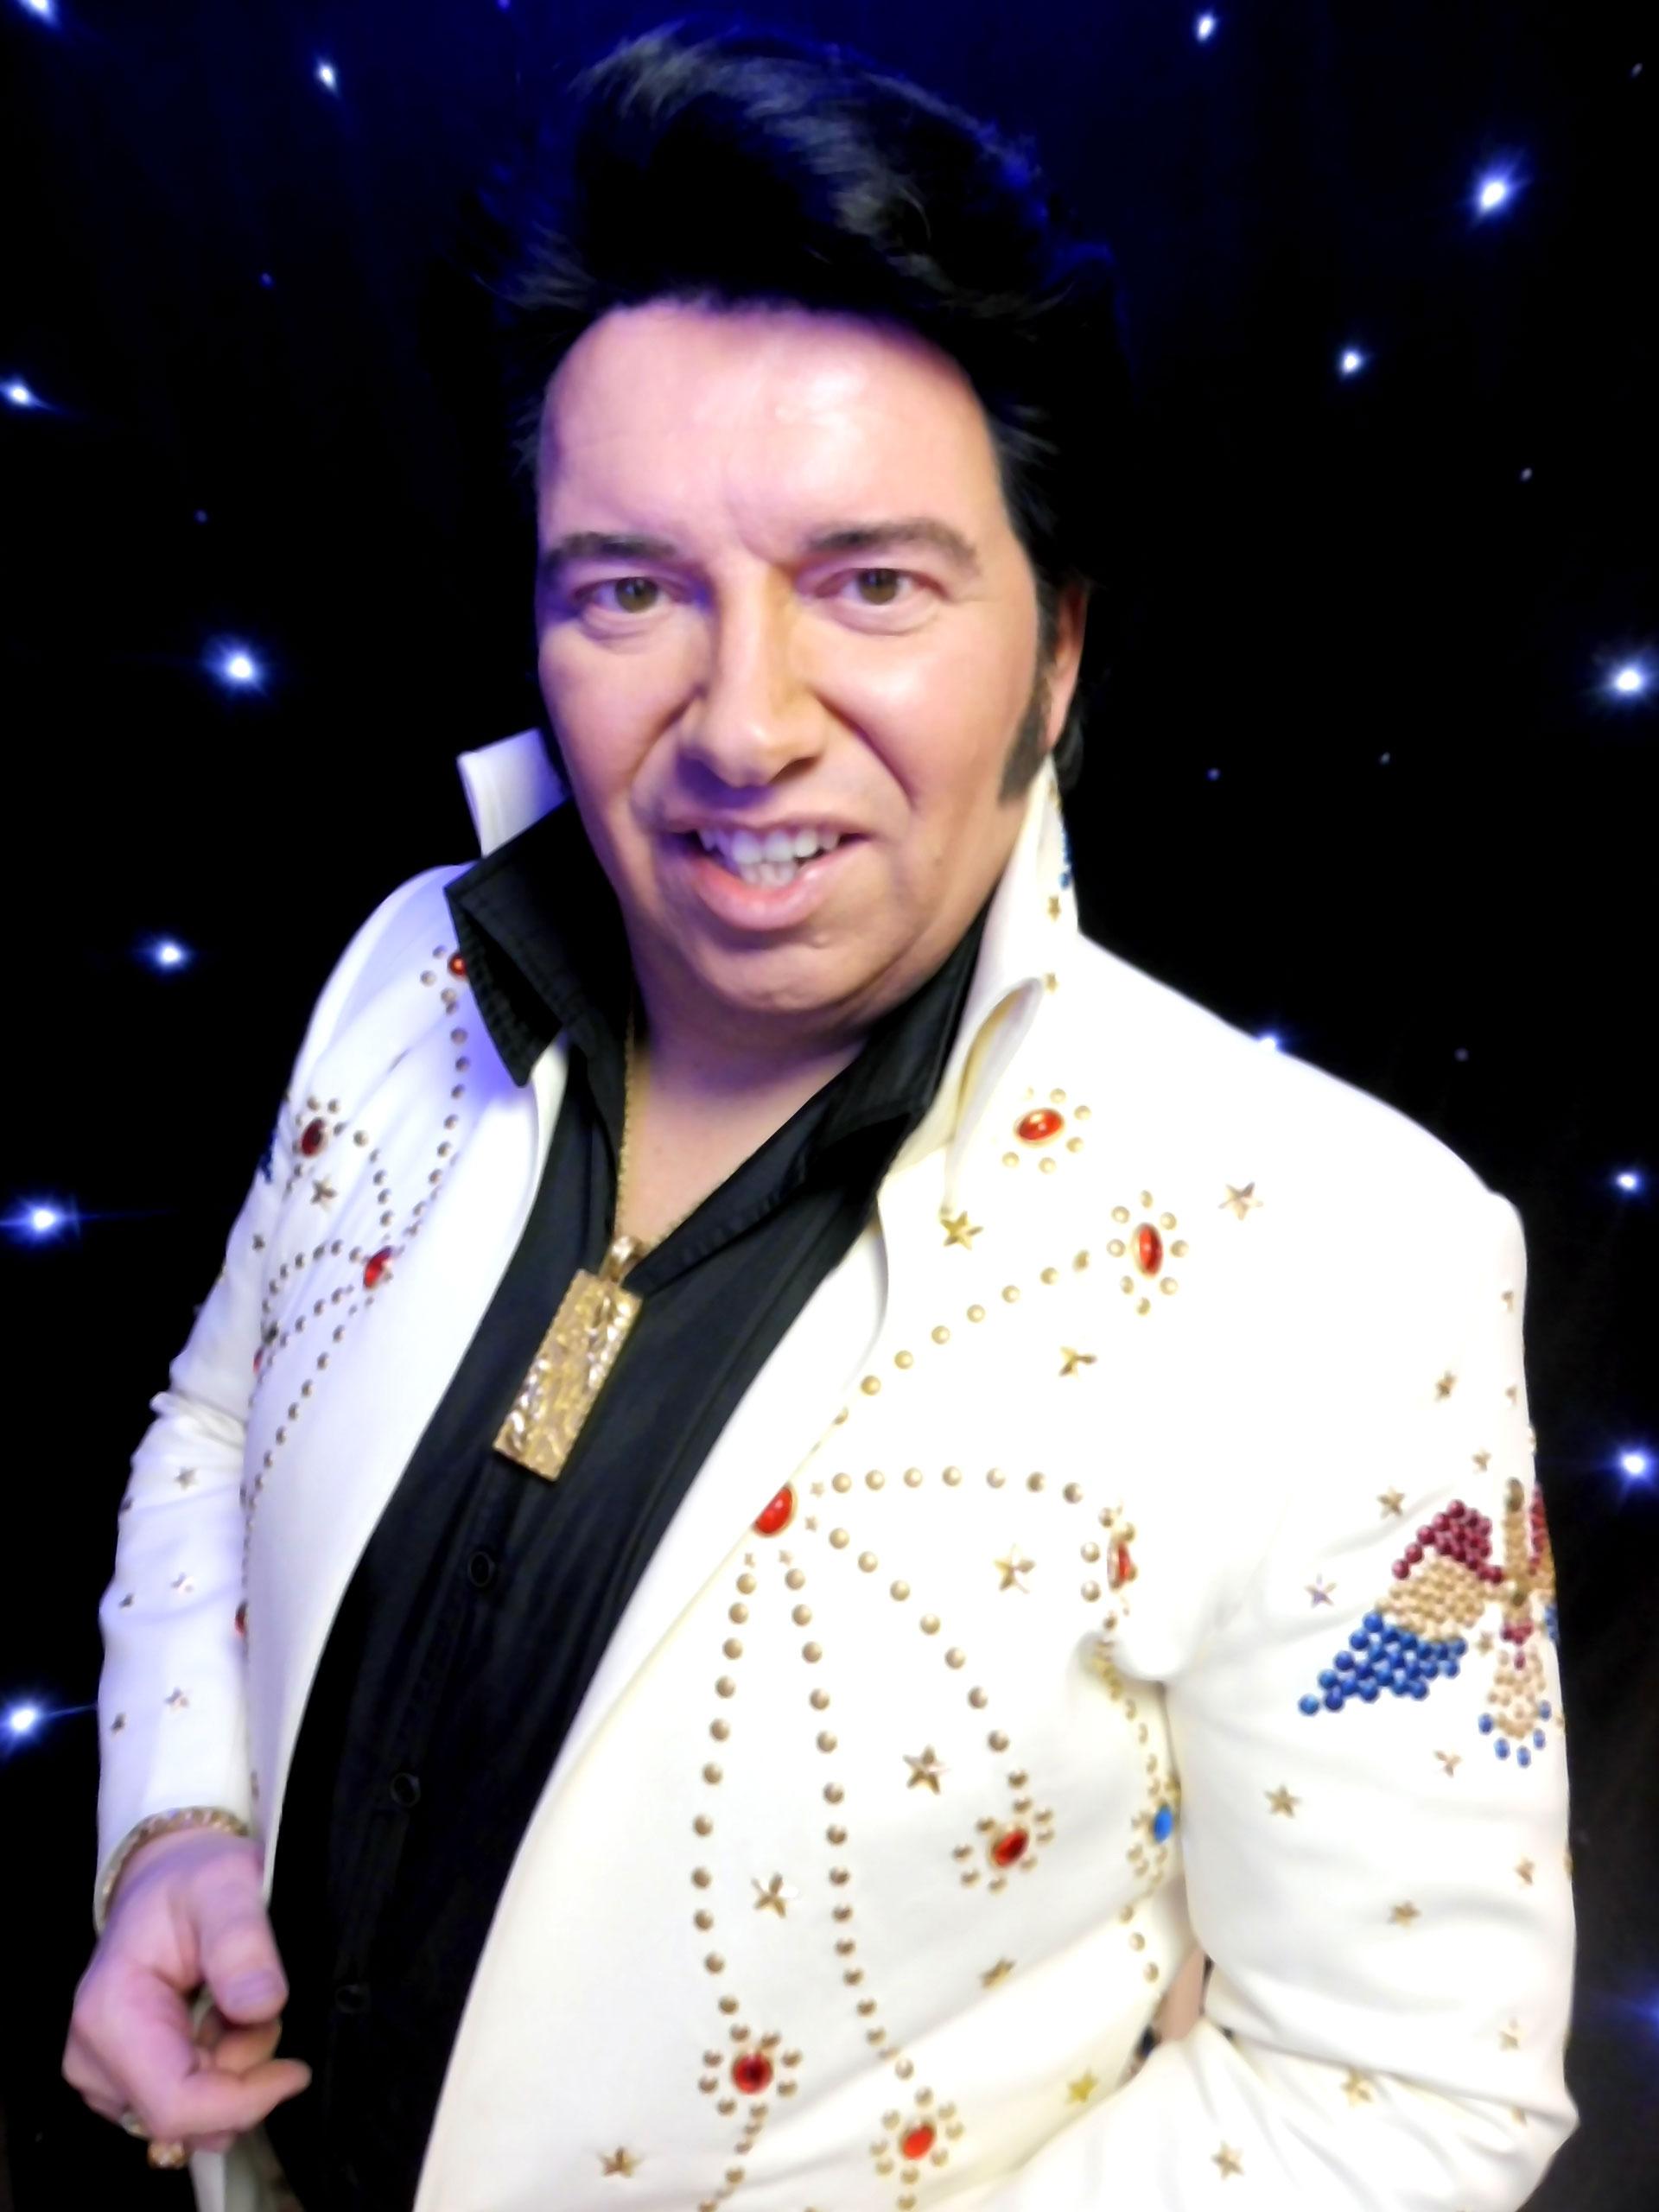 King-Eddy---Elvis-Tribute-Artist-web